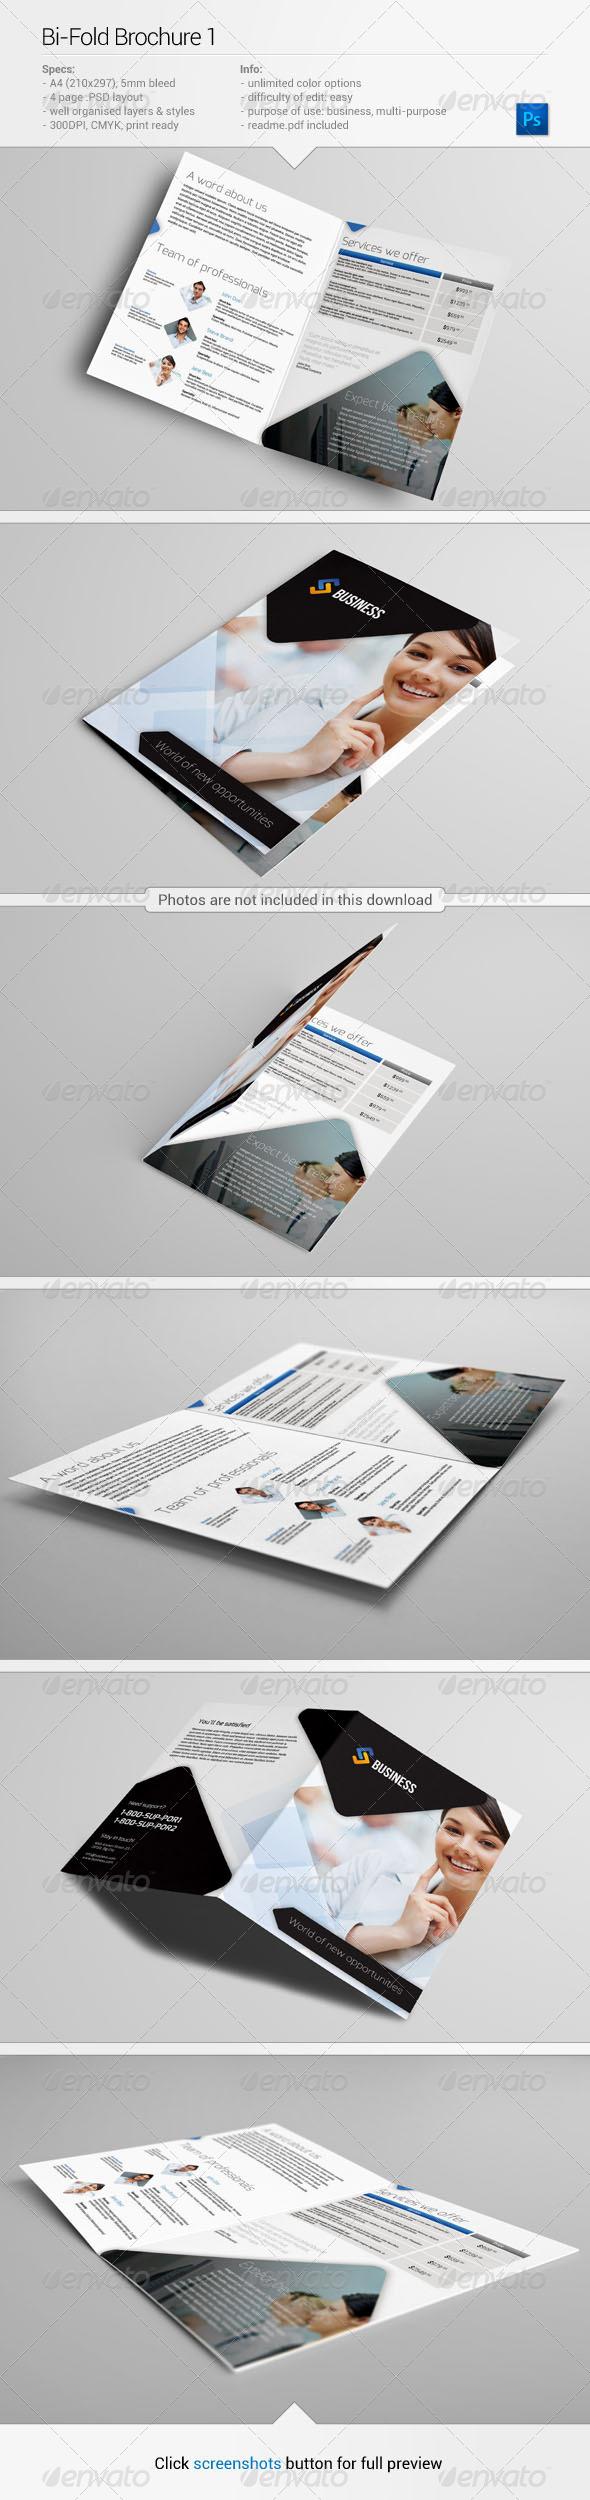 Bi-fold Brochure 1